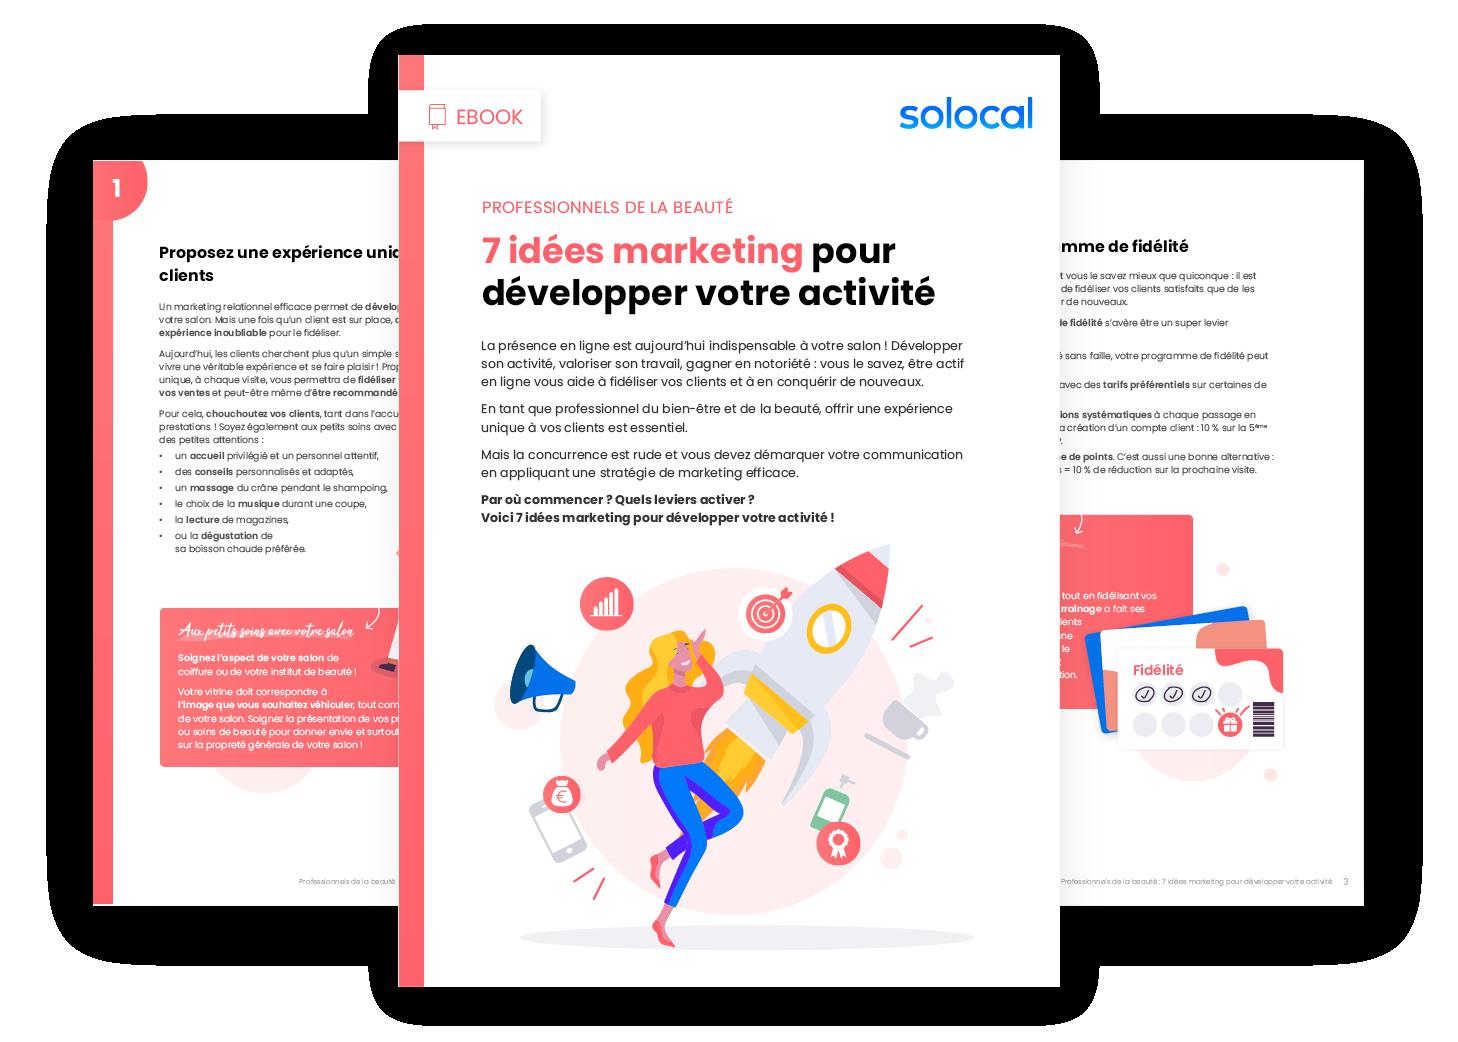 2021_03_Solocal_ebook_beaute_7_idees_marketing